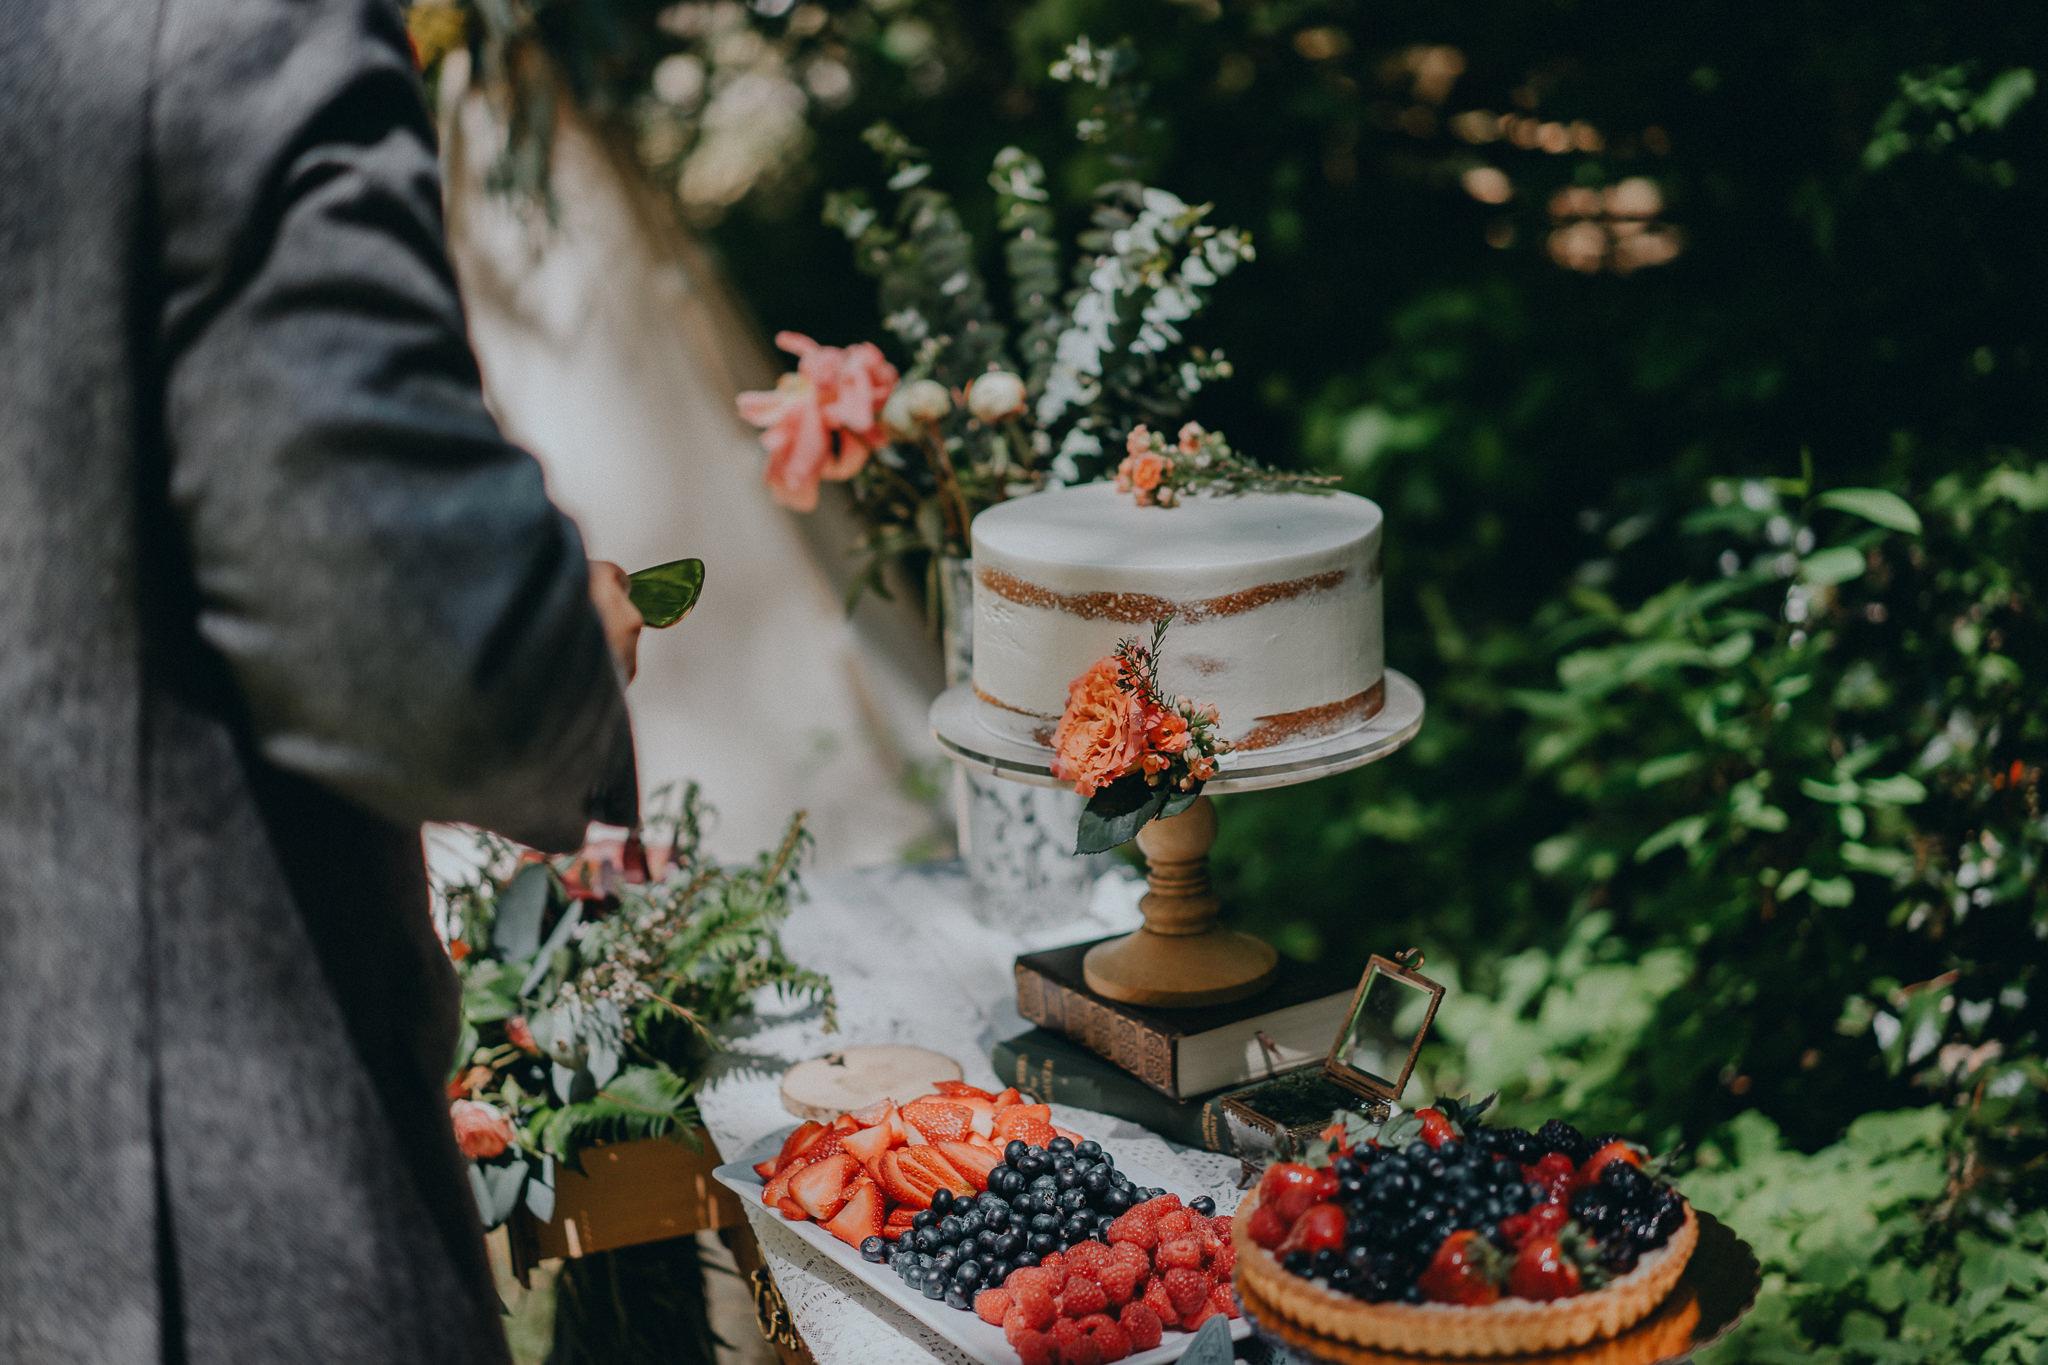 Cake-cutting-Alfred-Tang-Wedding-Photographer